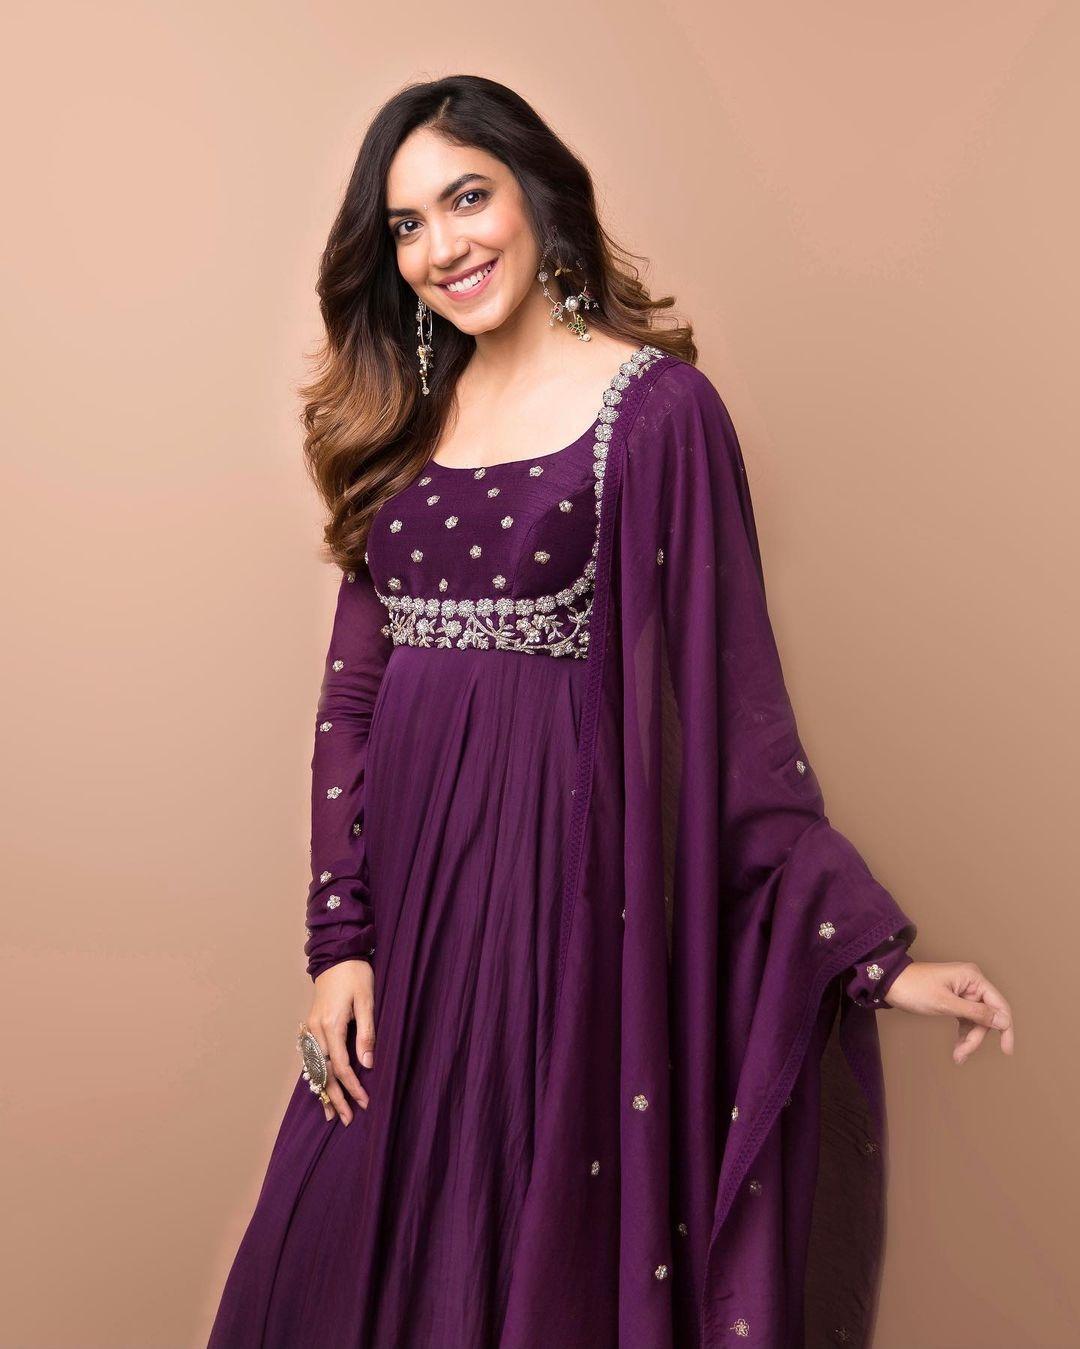 Ritu Varma in purple anarkali gown by Mrunalini rao for Tuck Jagadish promotions-1